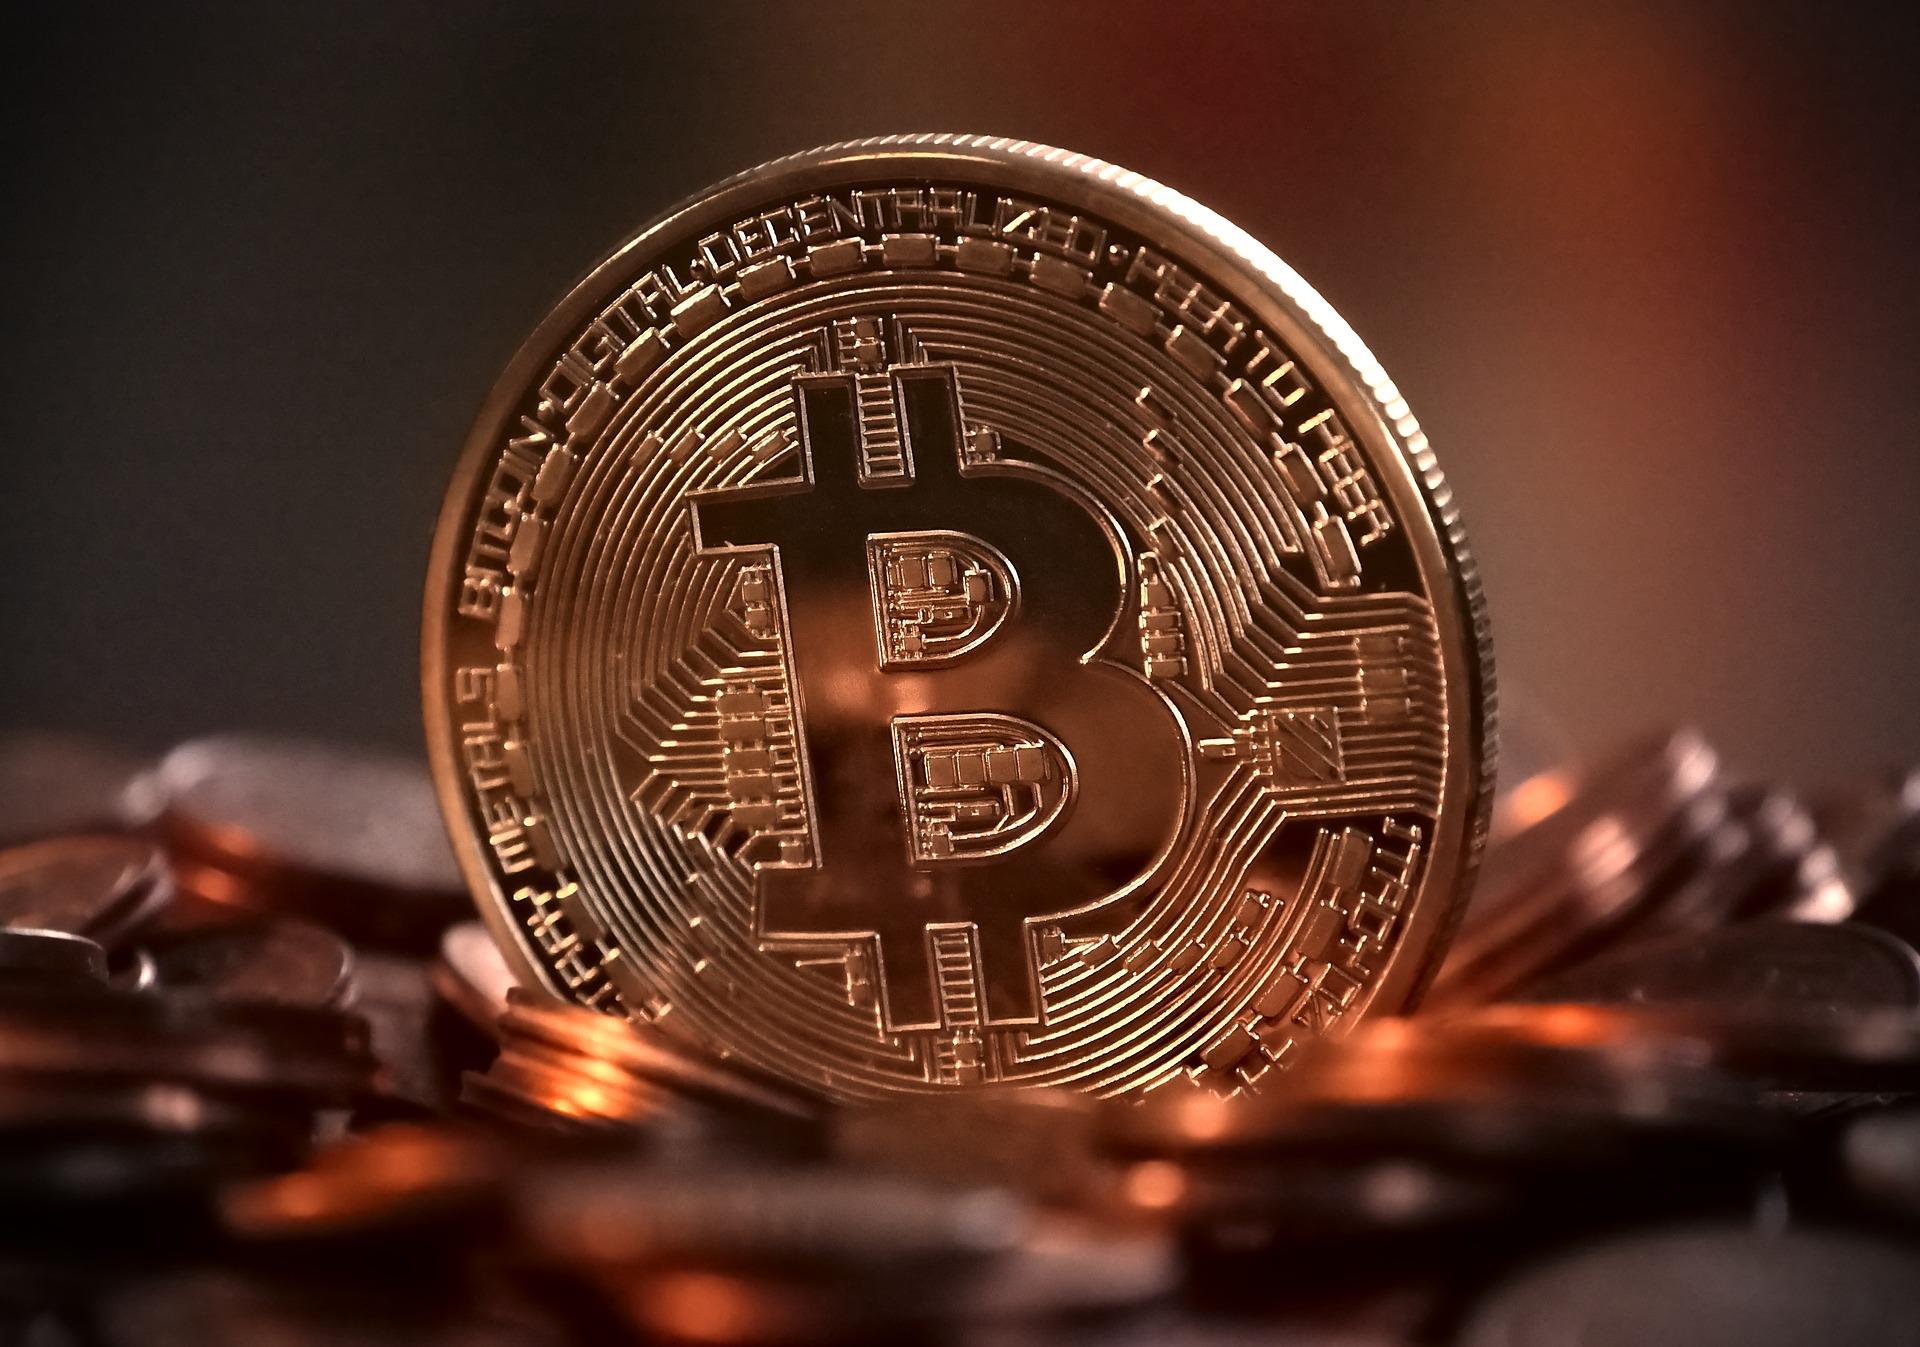 Raak bekend met de risico's van cryptocurrency